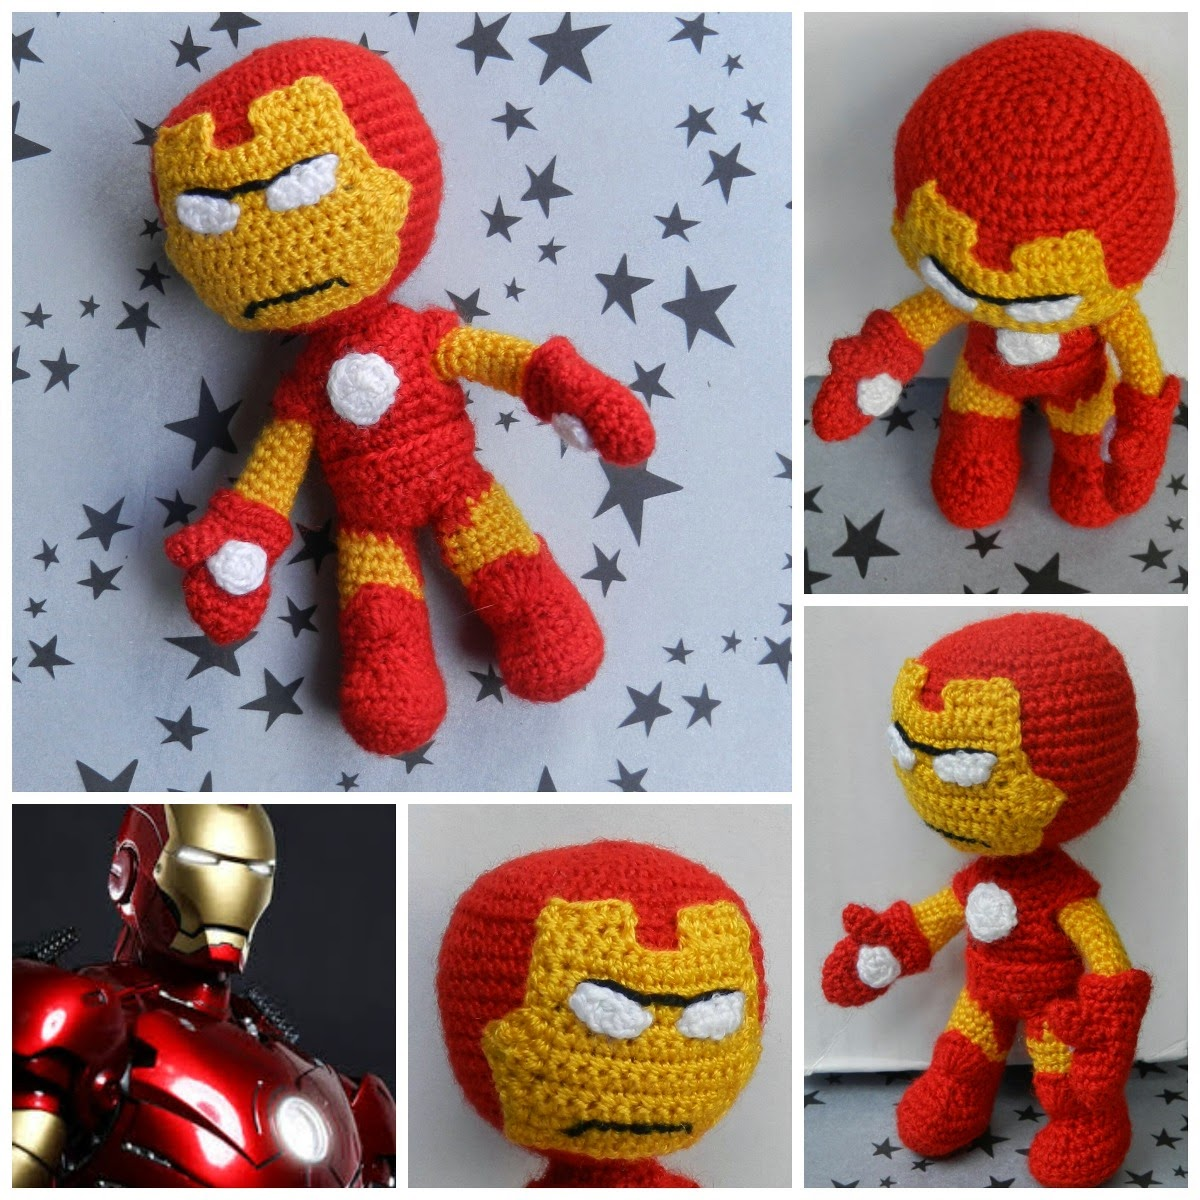 Iron Man | Crochet patterns amigurumi, Crochet batman, Crochet ... | 1200x1200